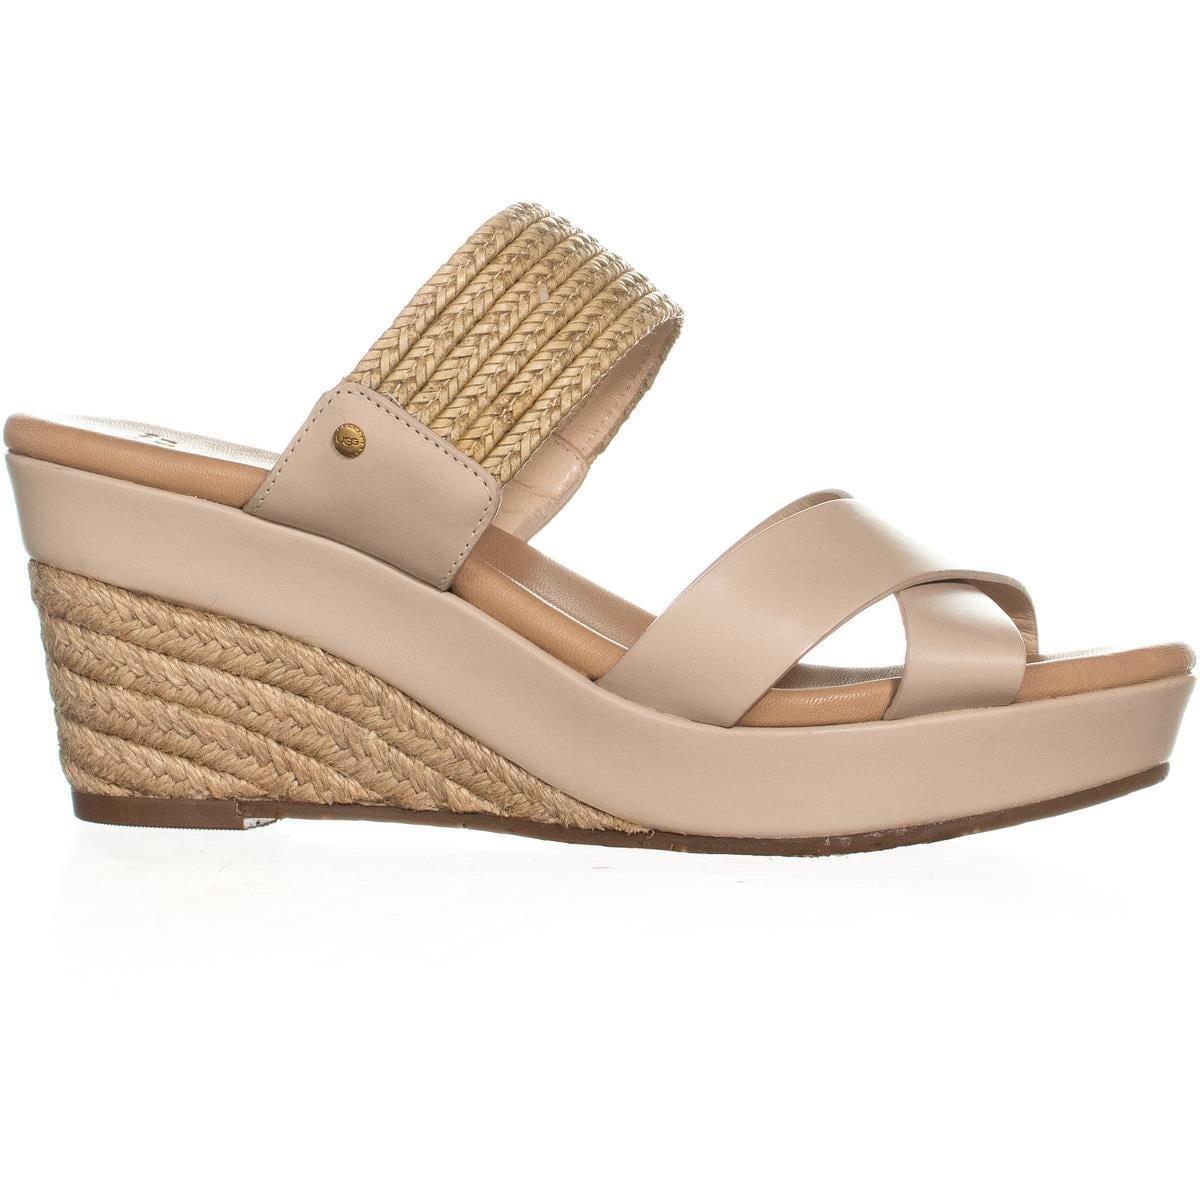 613d13a7892 UGG Adriana Wedge Mule Sandals, Horchata - 9 US / 40 EU